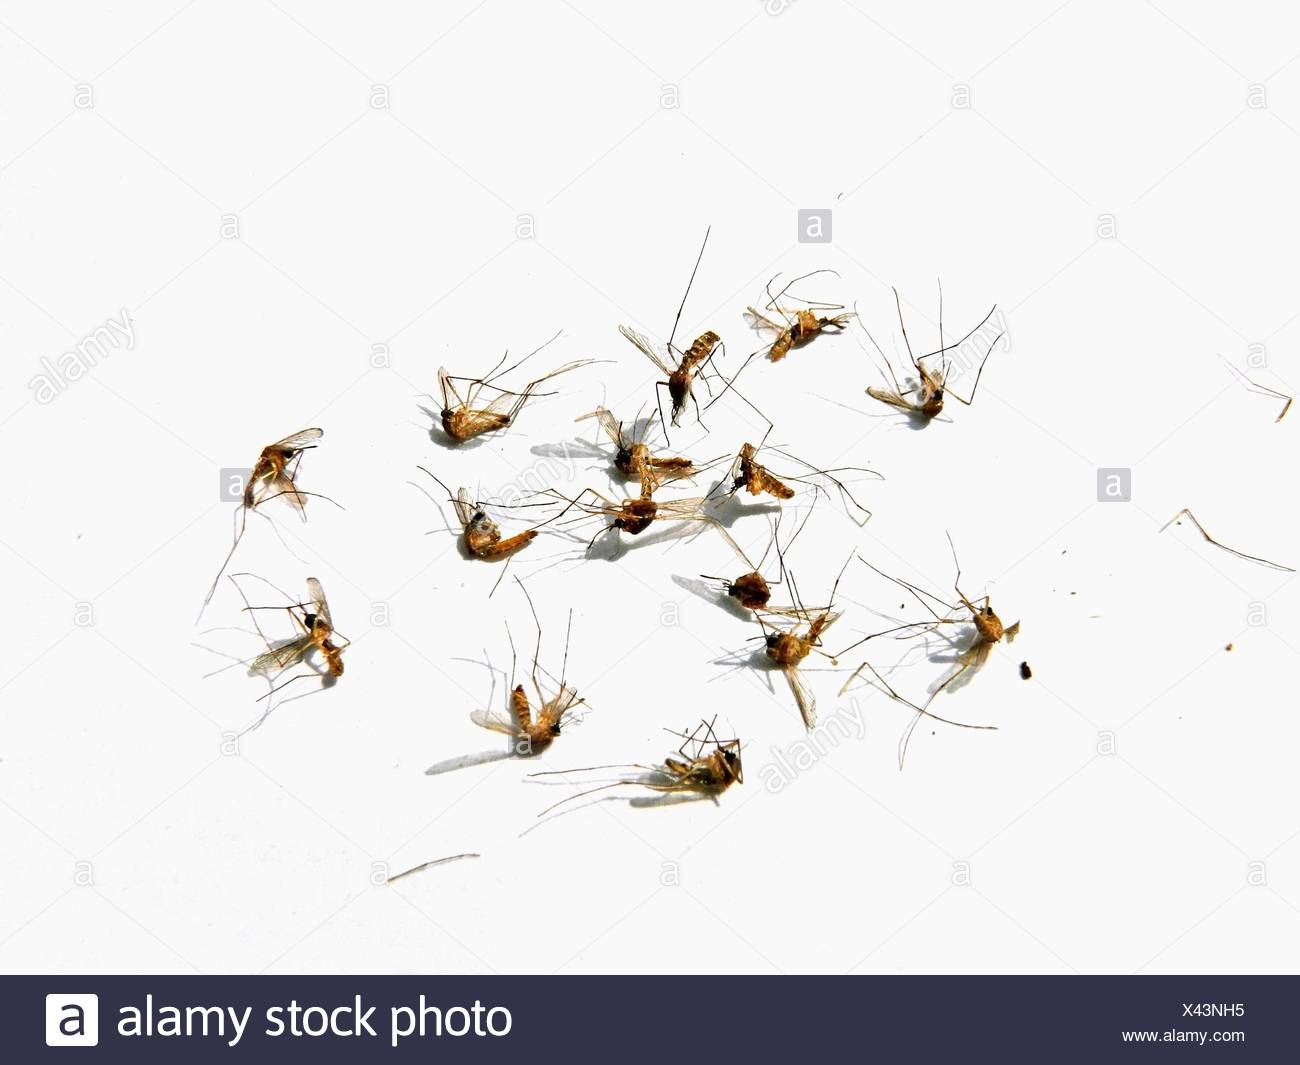 Dead Mosquitos - Stock Image